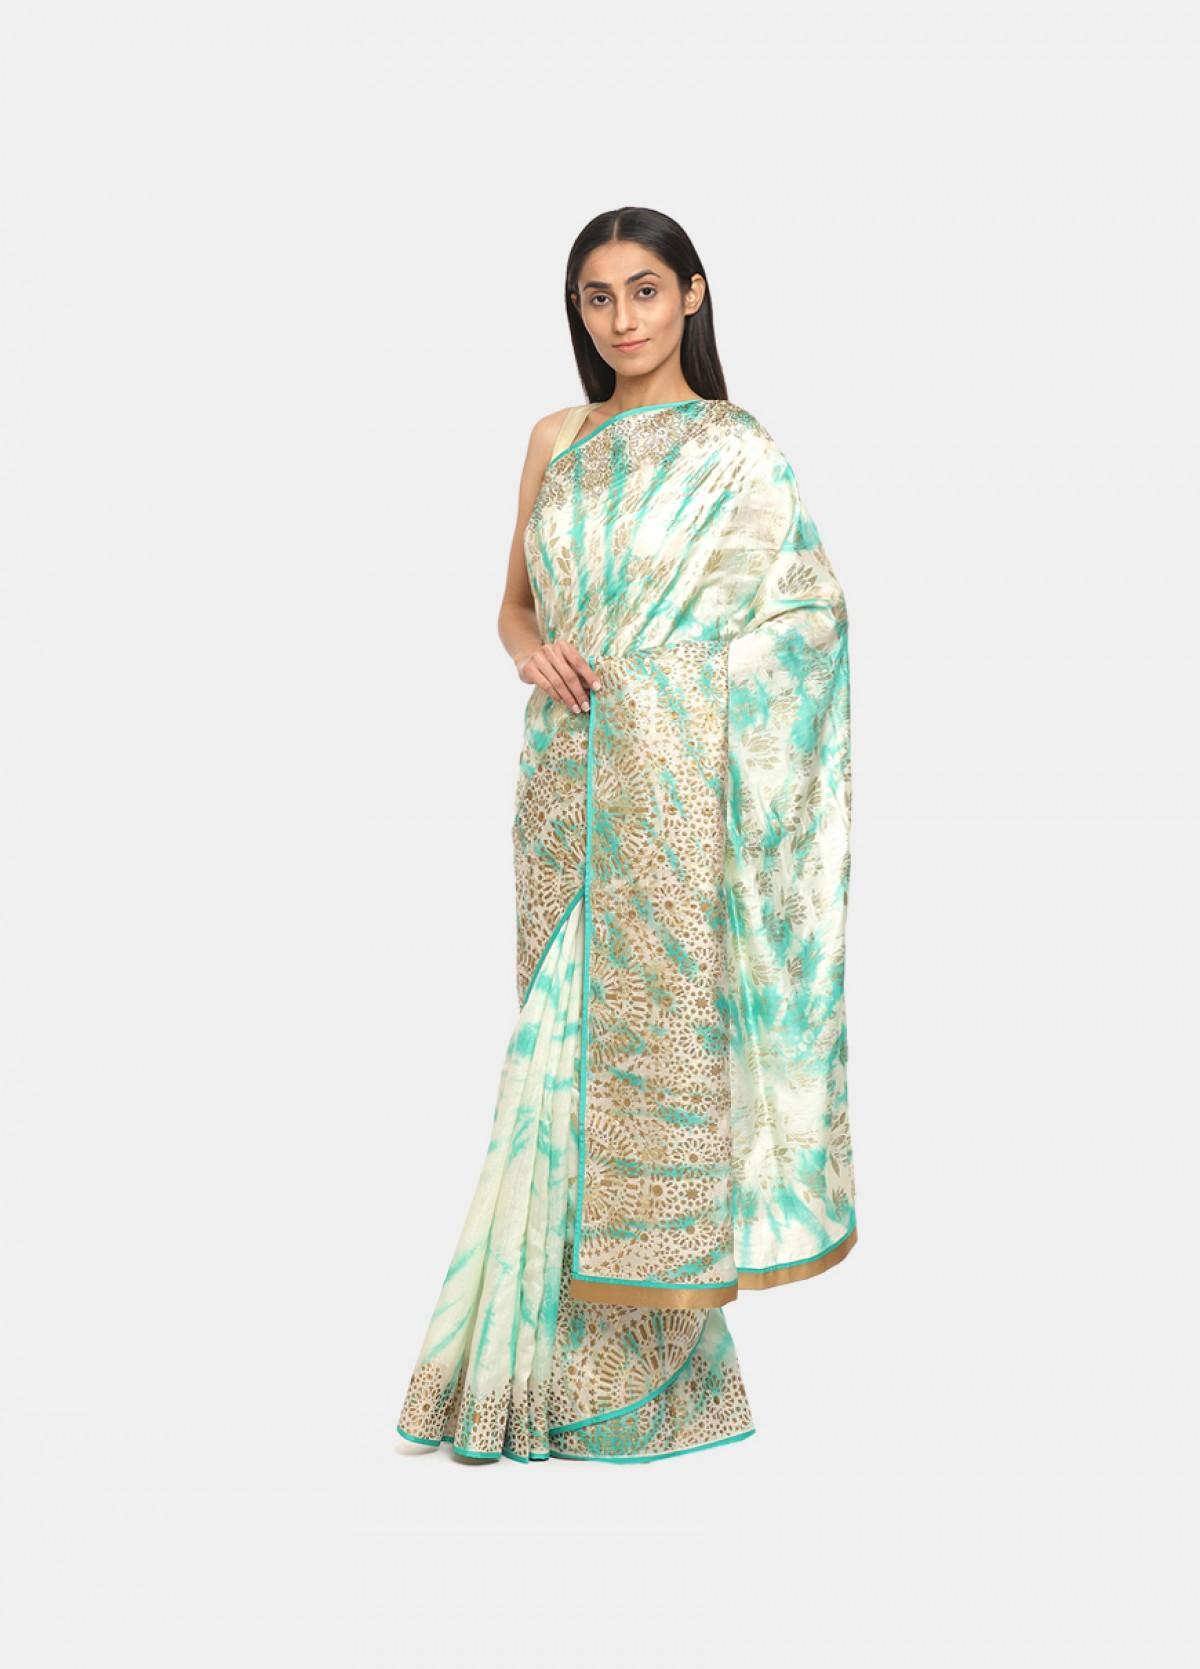 The White Banarasi Silk Embroidered Sari